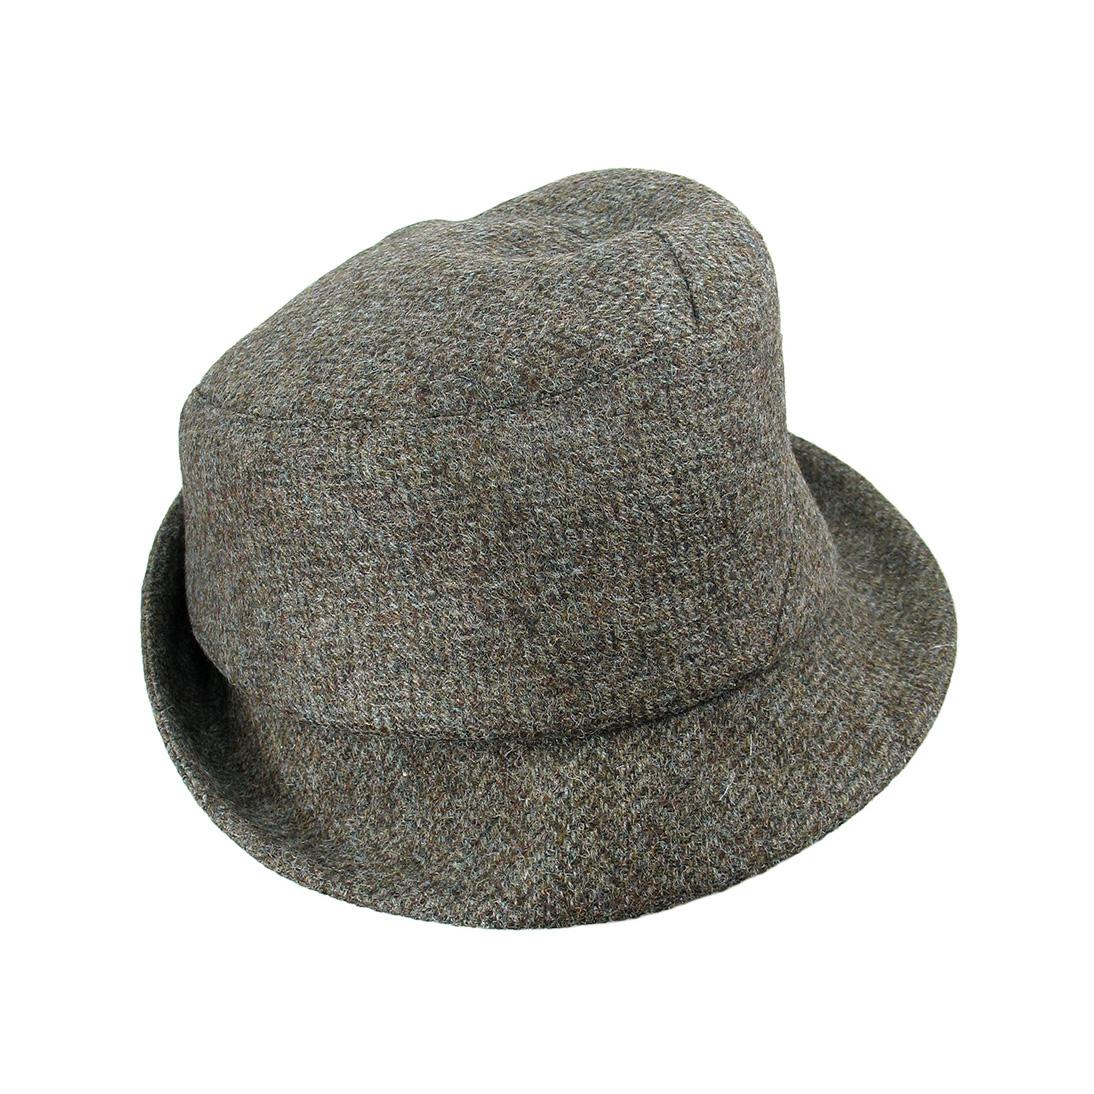 ee1a4d2e14f76 Wool Tweed Men s Winter Trilby Hat -  Sedley  in Herringbone - By Karen  Henriksen